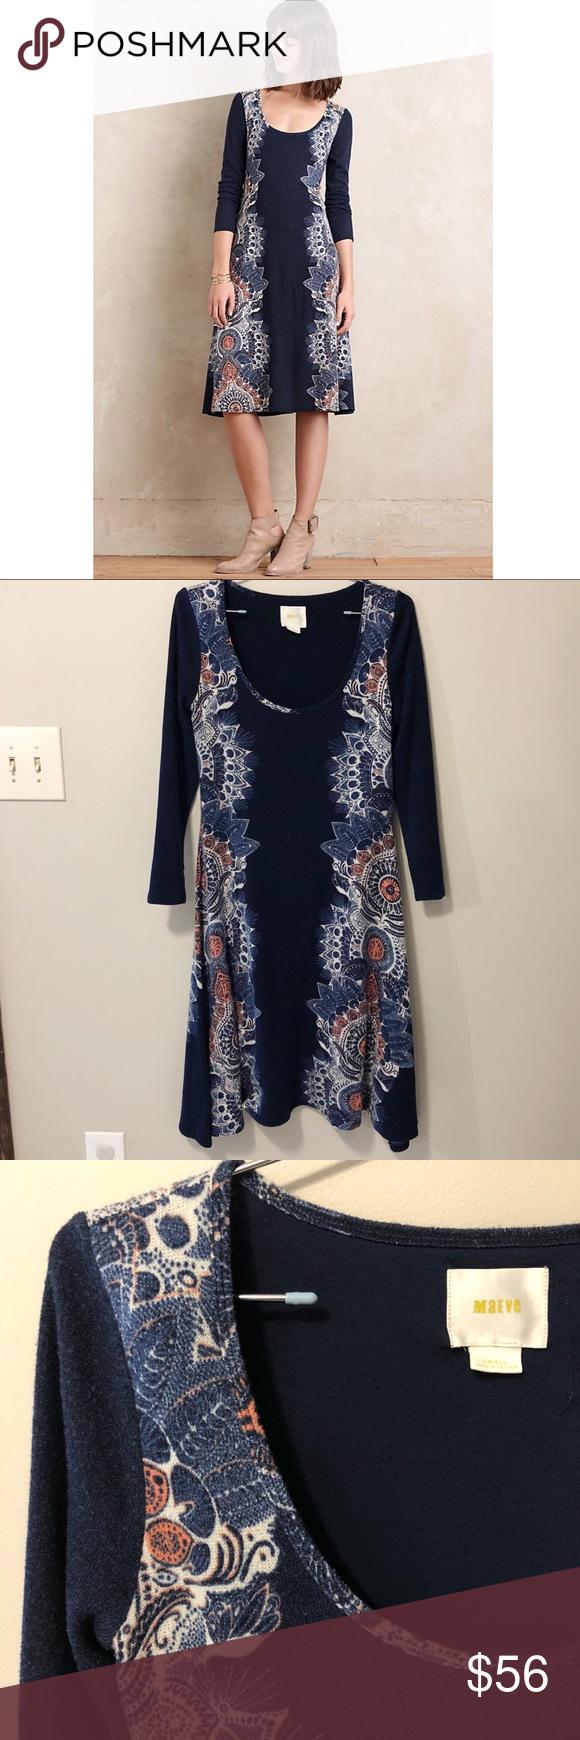 1450da09f82d Maeve | Eira Sweater Boho Modi Dress Maeve for Anthropologie Eira 3/4  sleeve sweater